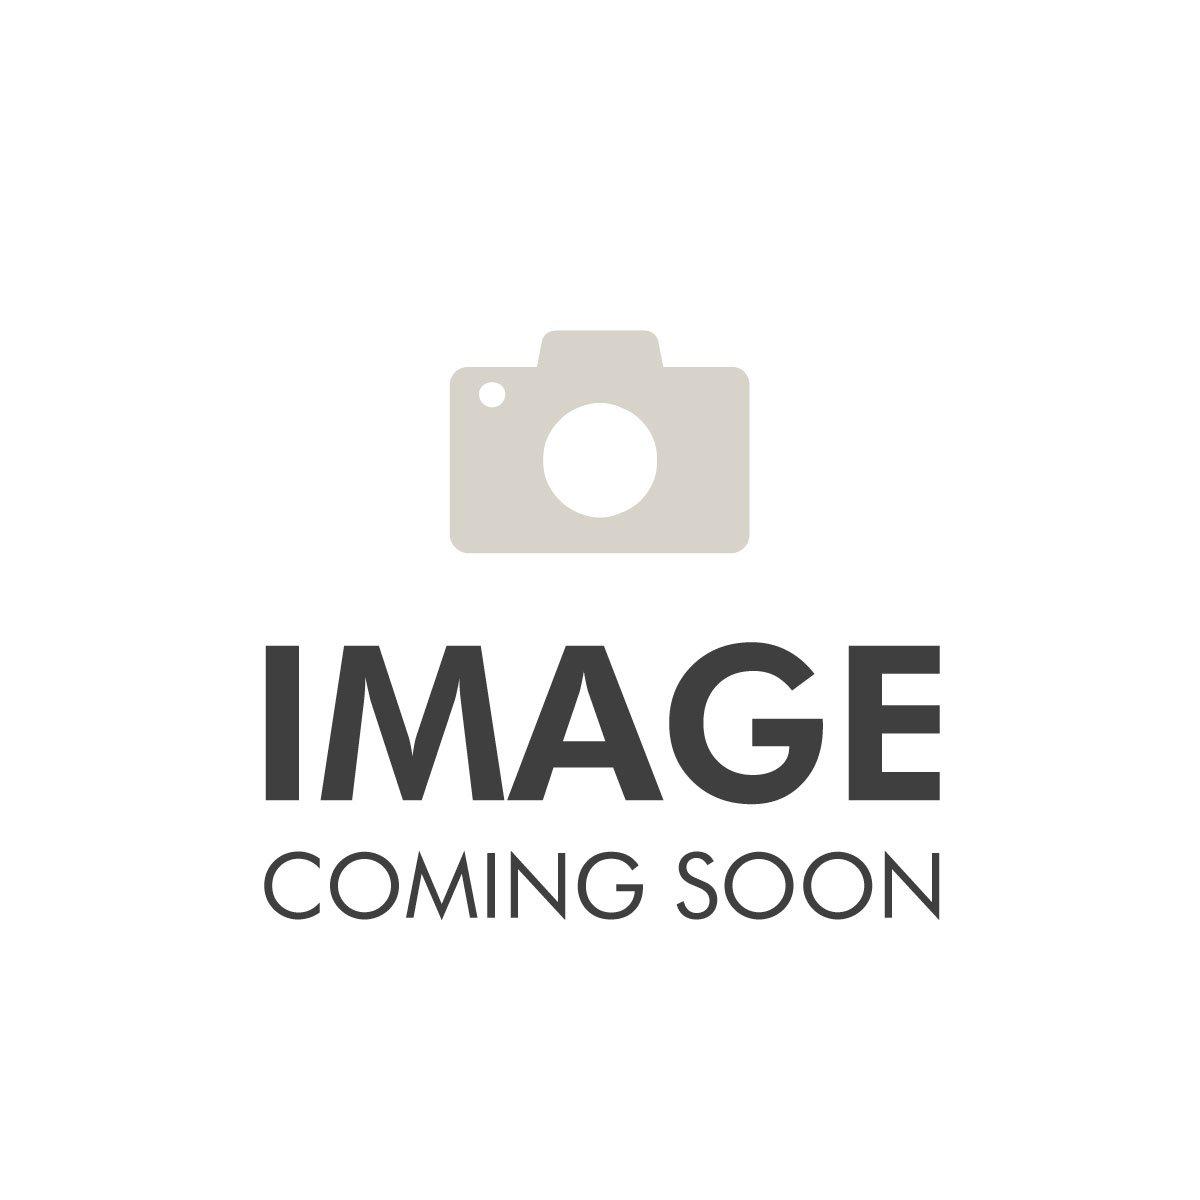 Clarins Blush Prodige Illuminating Cheek Colour 02 Soft Peach